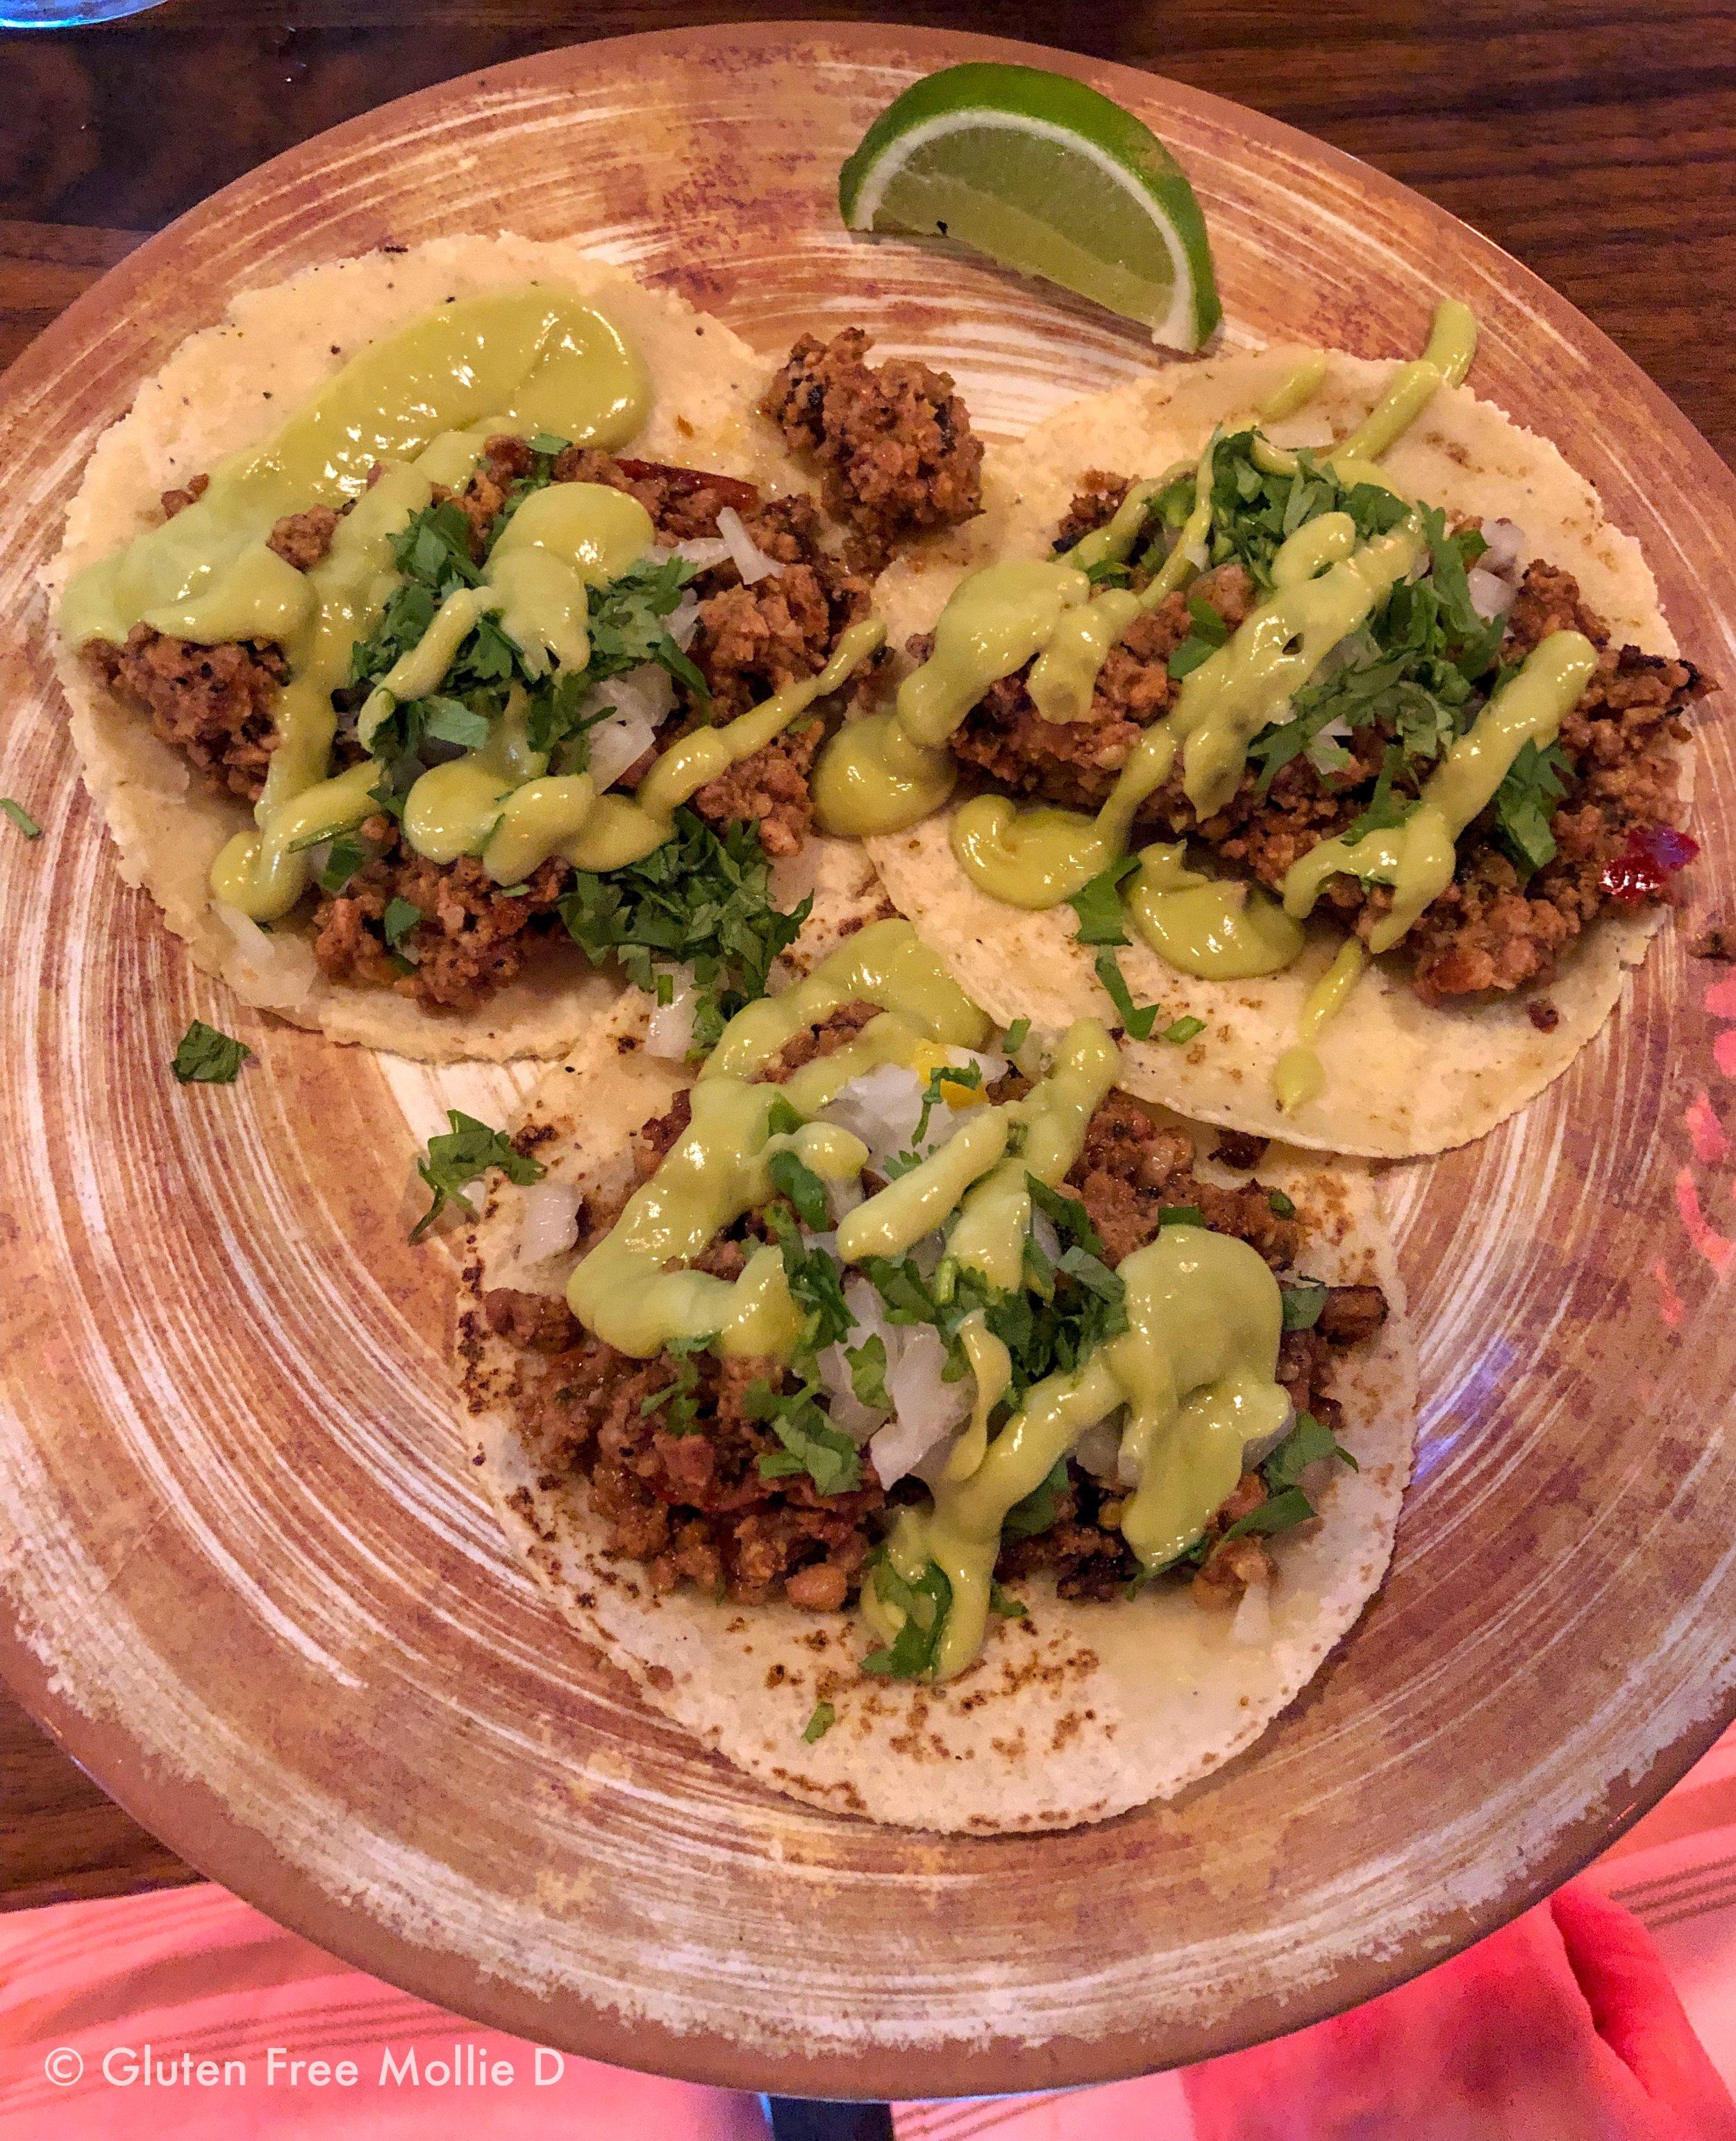 Chorizo tacos. Yum.